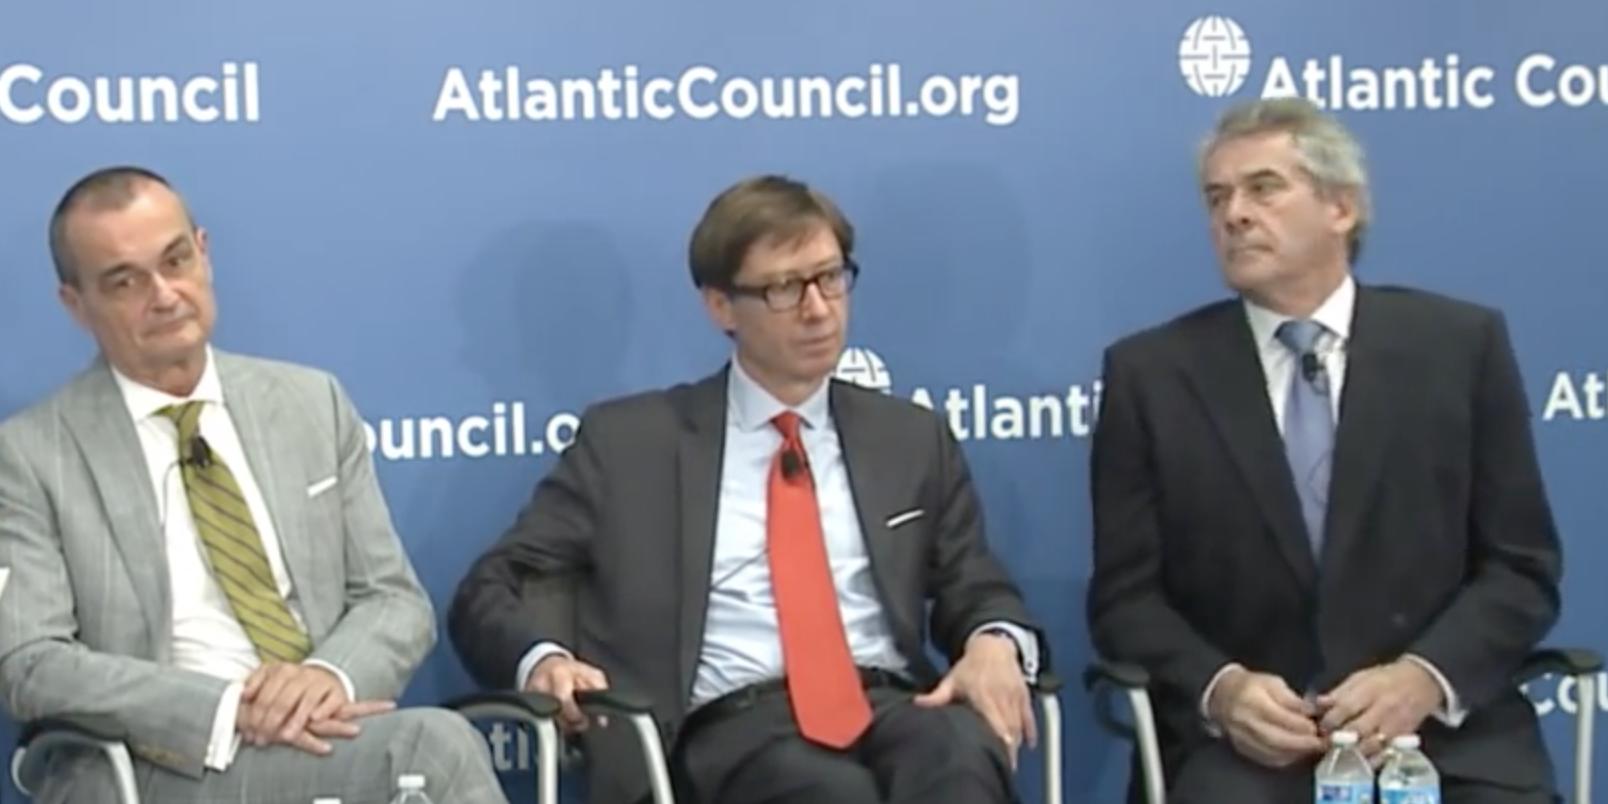 French ambassador to the U.S. Gerard Araud, German to the ambassador U.S. Peter Wittig and U.K. to the ambassador U.S Peter Westmacott at The Atlantic Council on May 26, 2015.